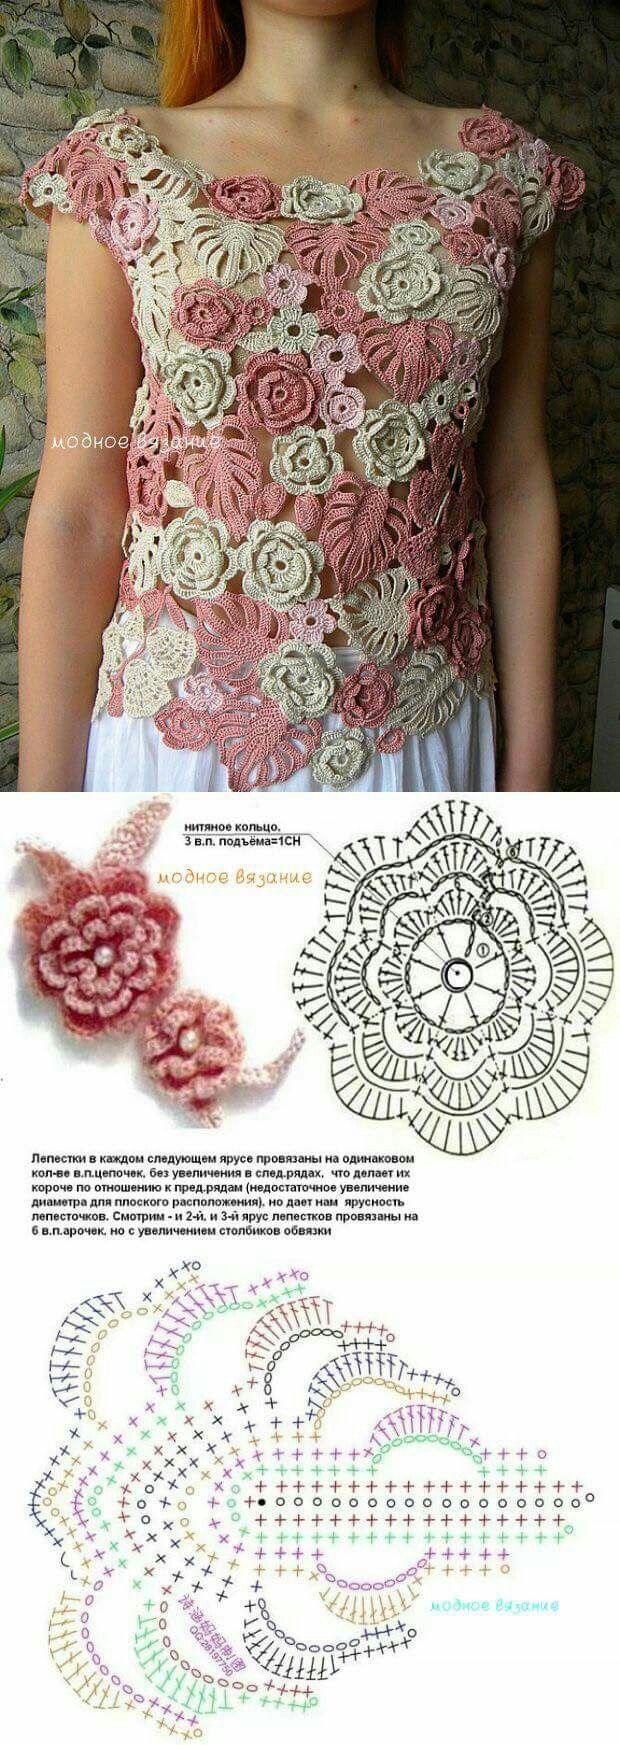 Pin de ingrid en tejidos | Pinterest | Blusas, Tejido y Ganchillo